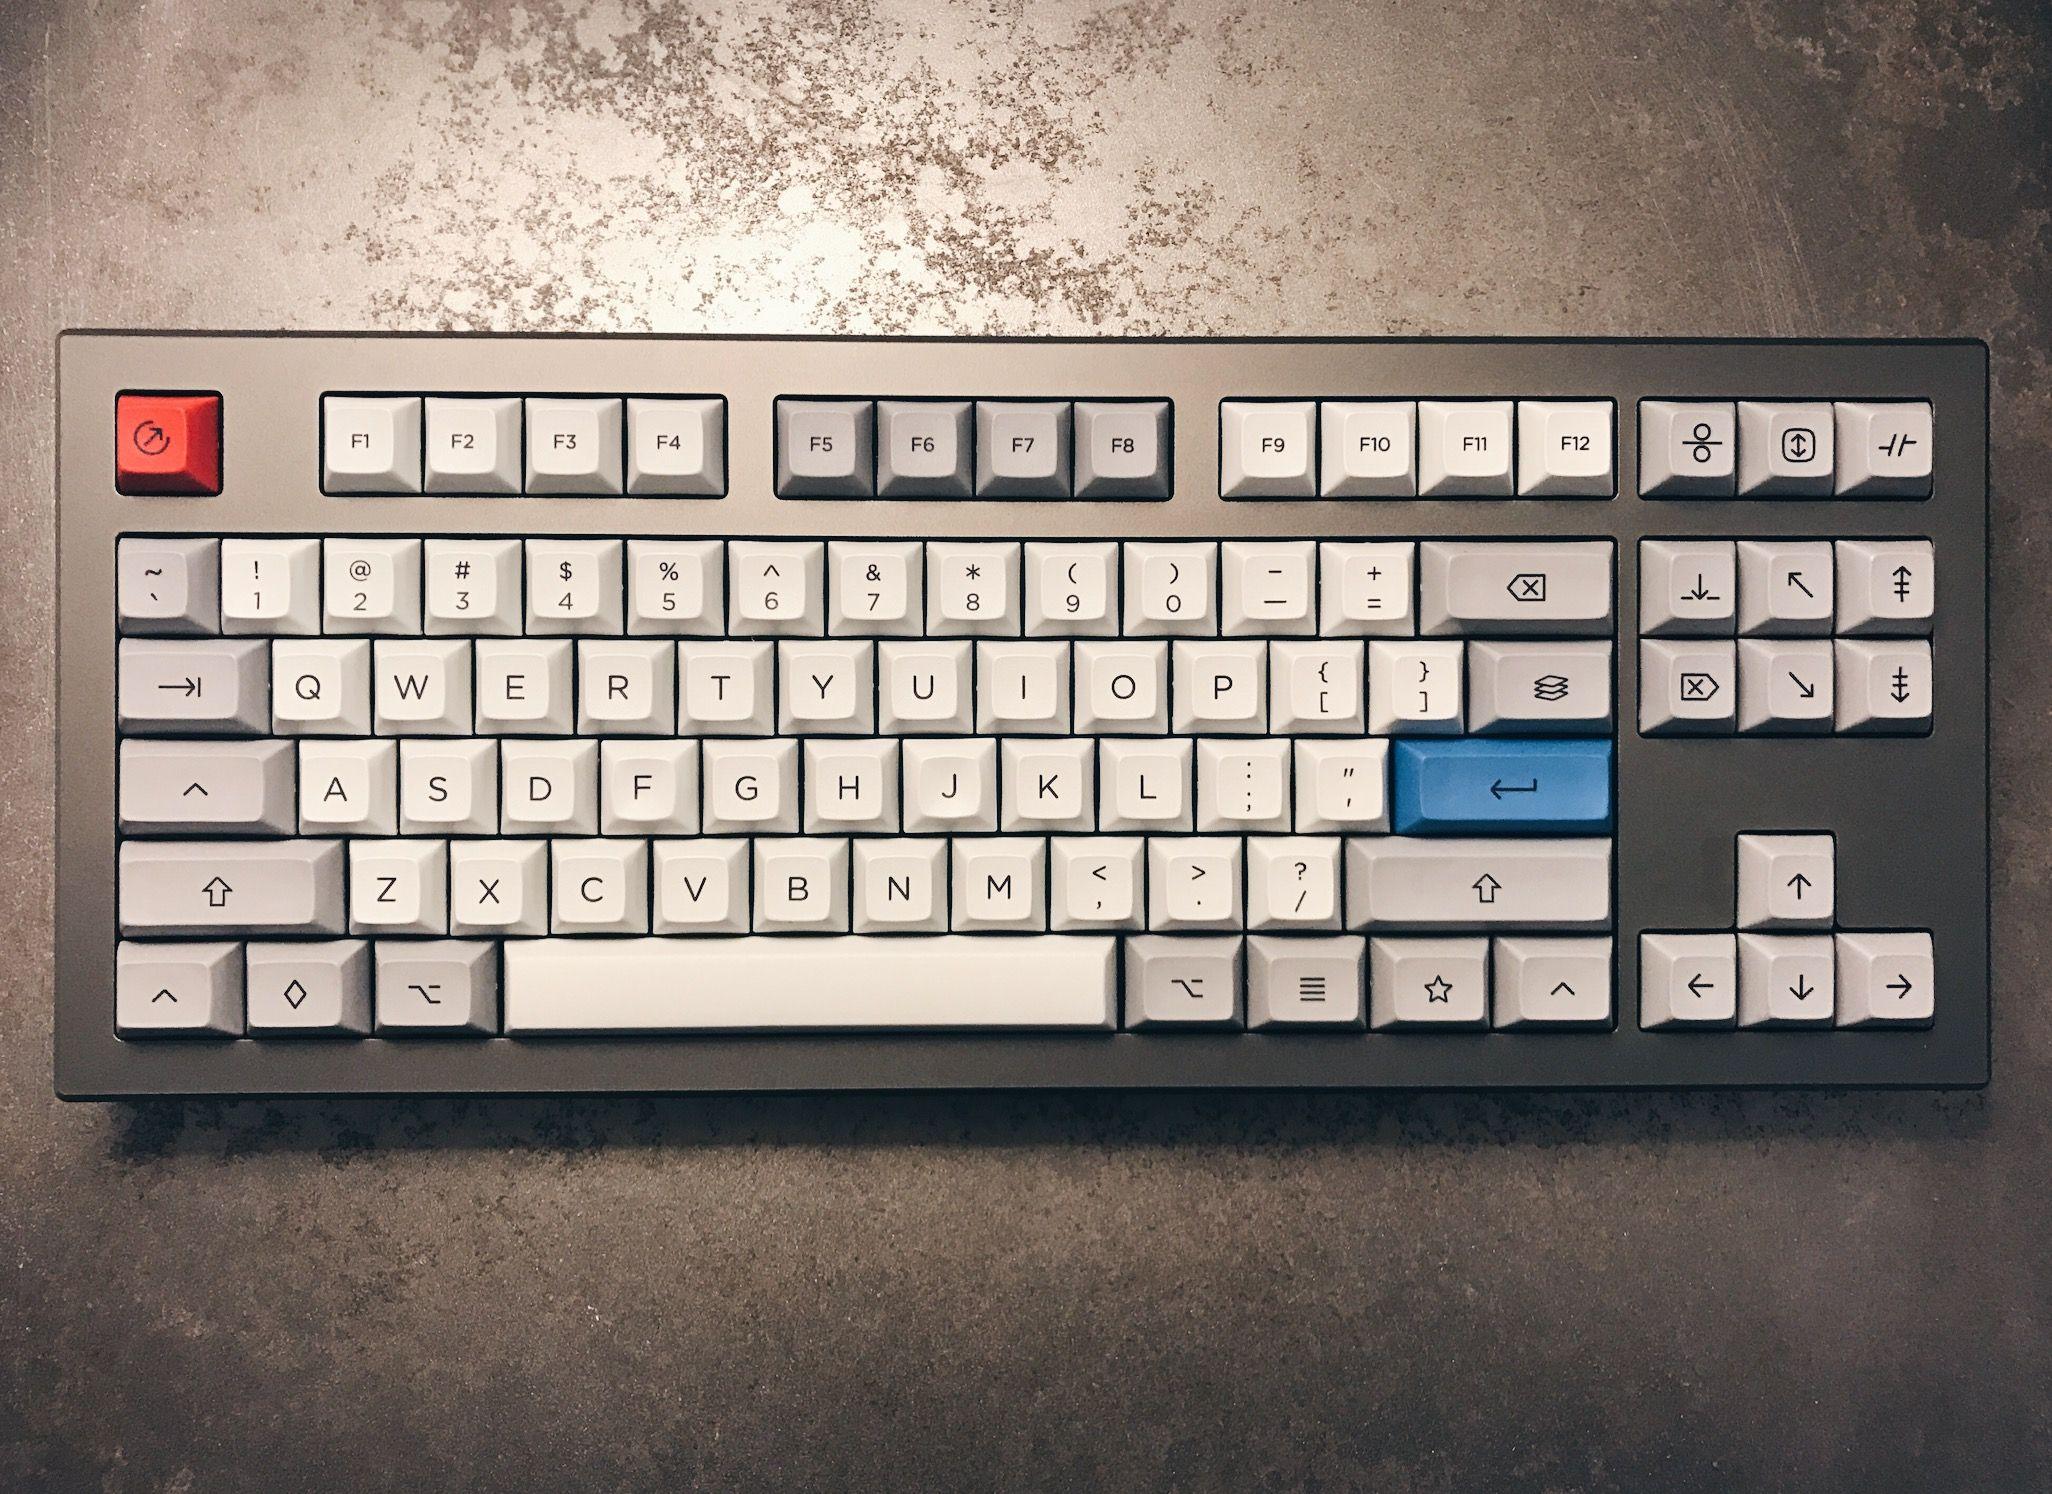 195b9c10011 Norbauer x NovaTouch x DSA Granite | Keyboard | Keyboard, Computer ...